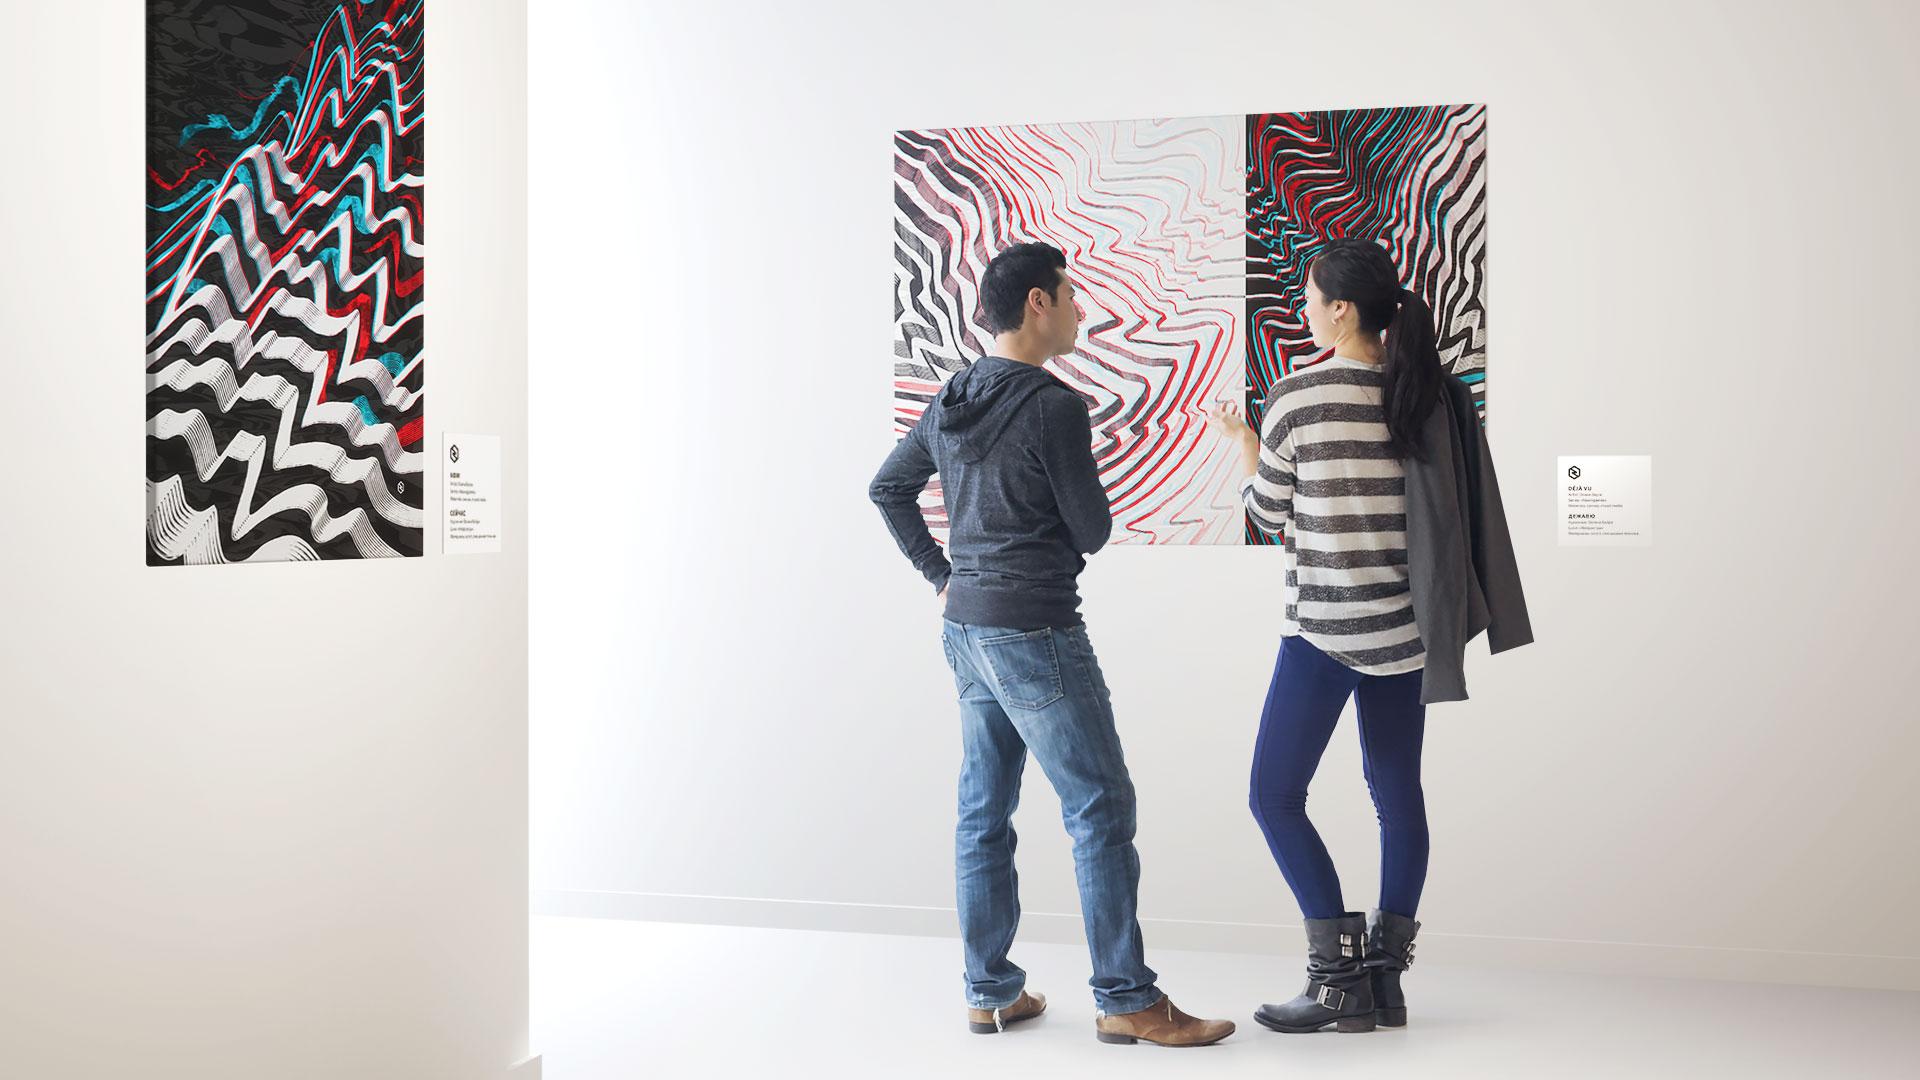 New Generation Art / neurogames / paintings by Oxana Bayra